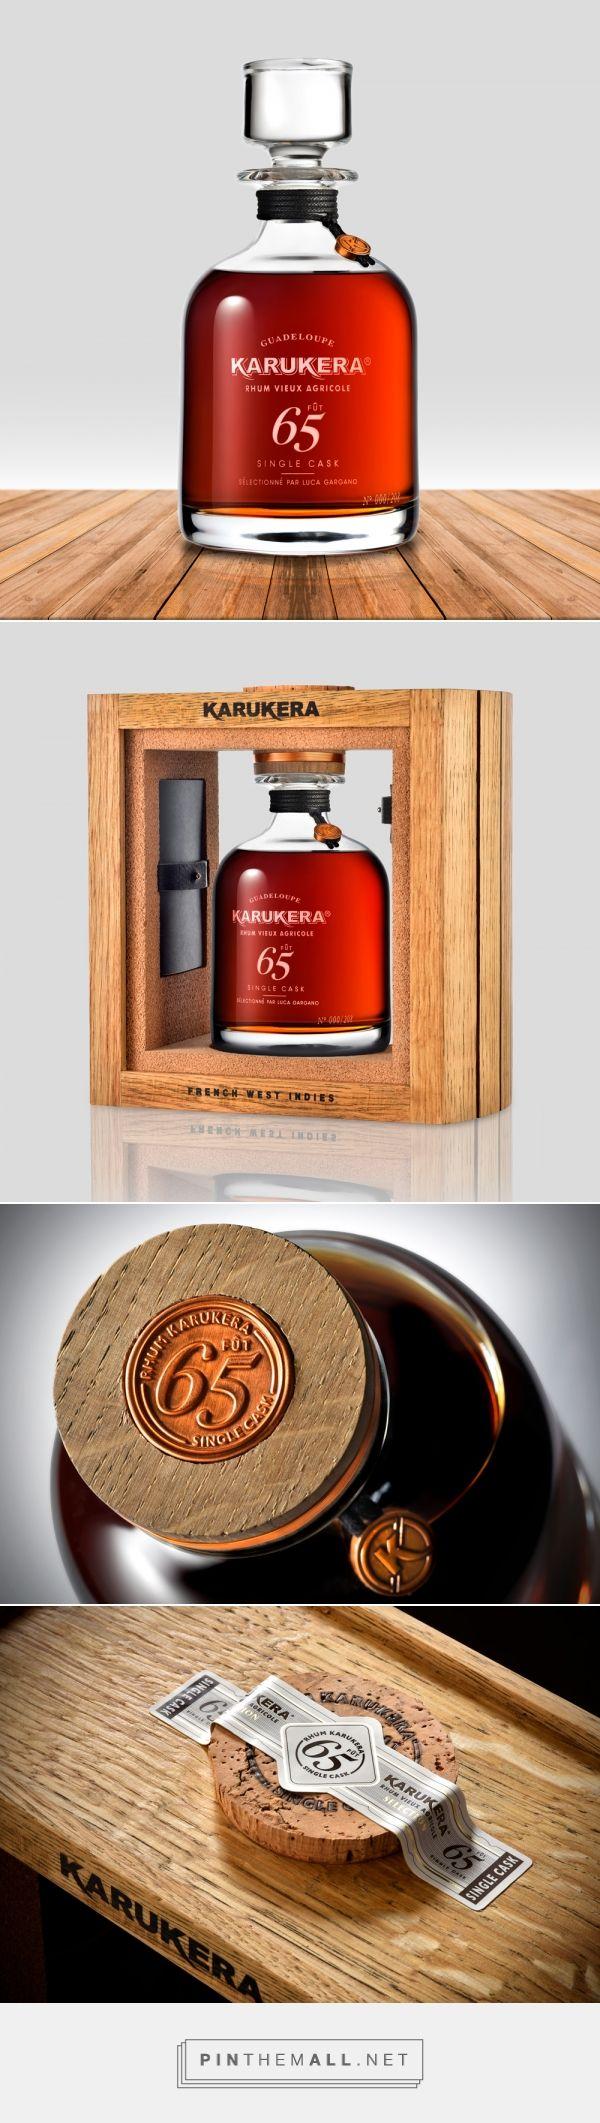 KARUKERA, FÛT 65 packaging design by LINEA - http://www.packagingoftheworld.com/2017/11/karukera-fut-65.html